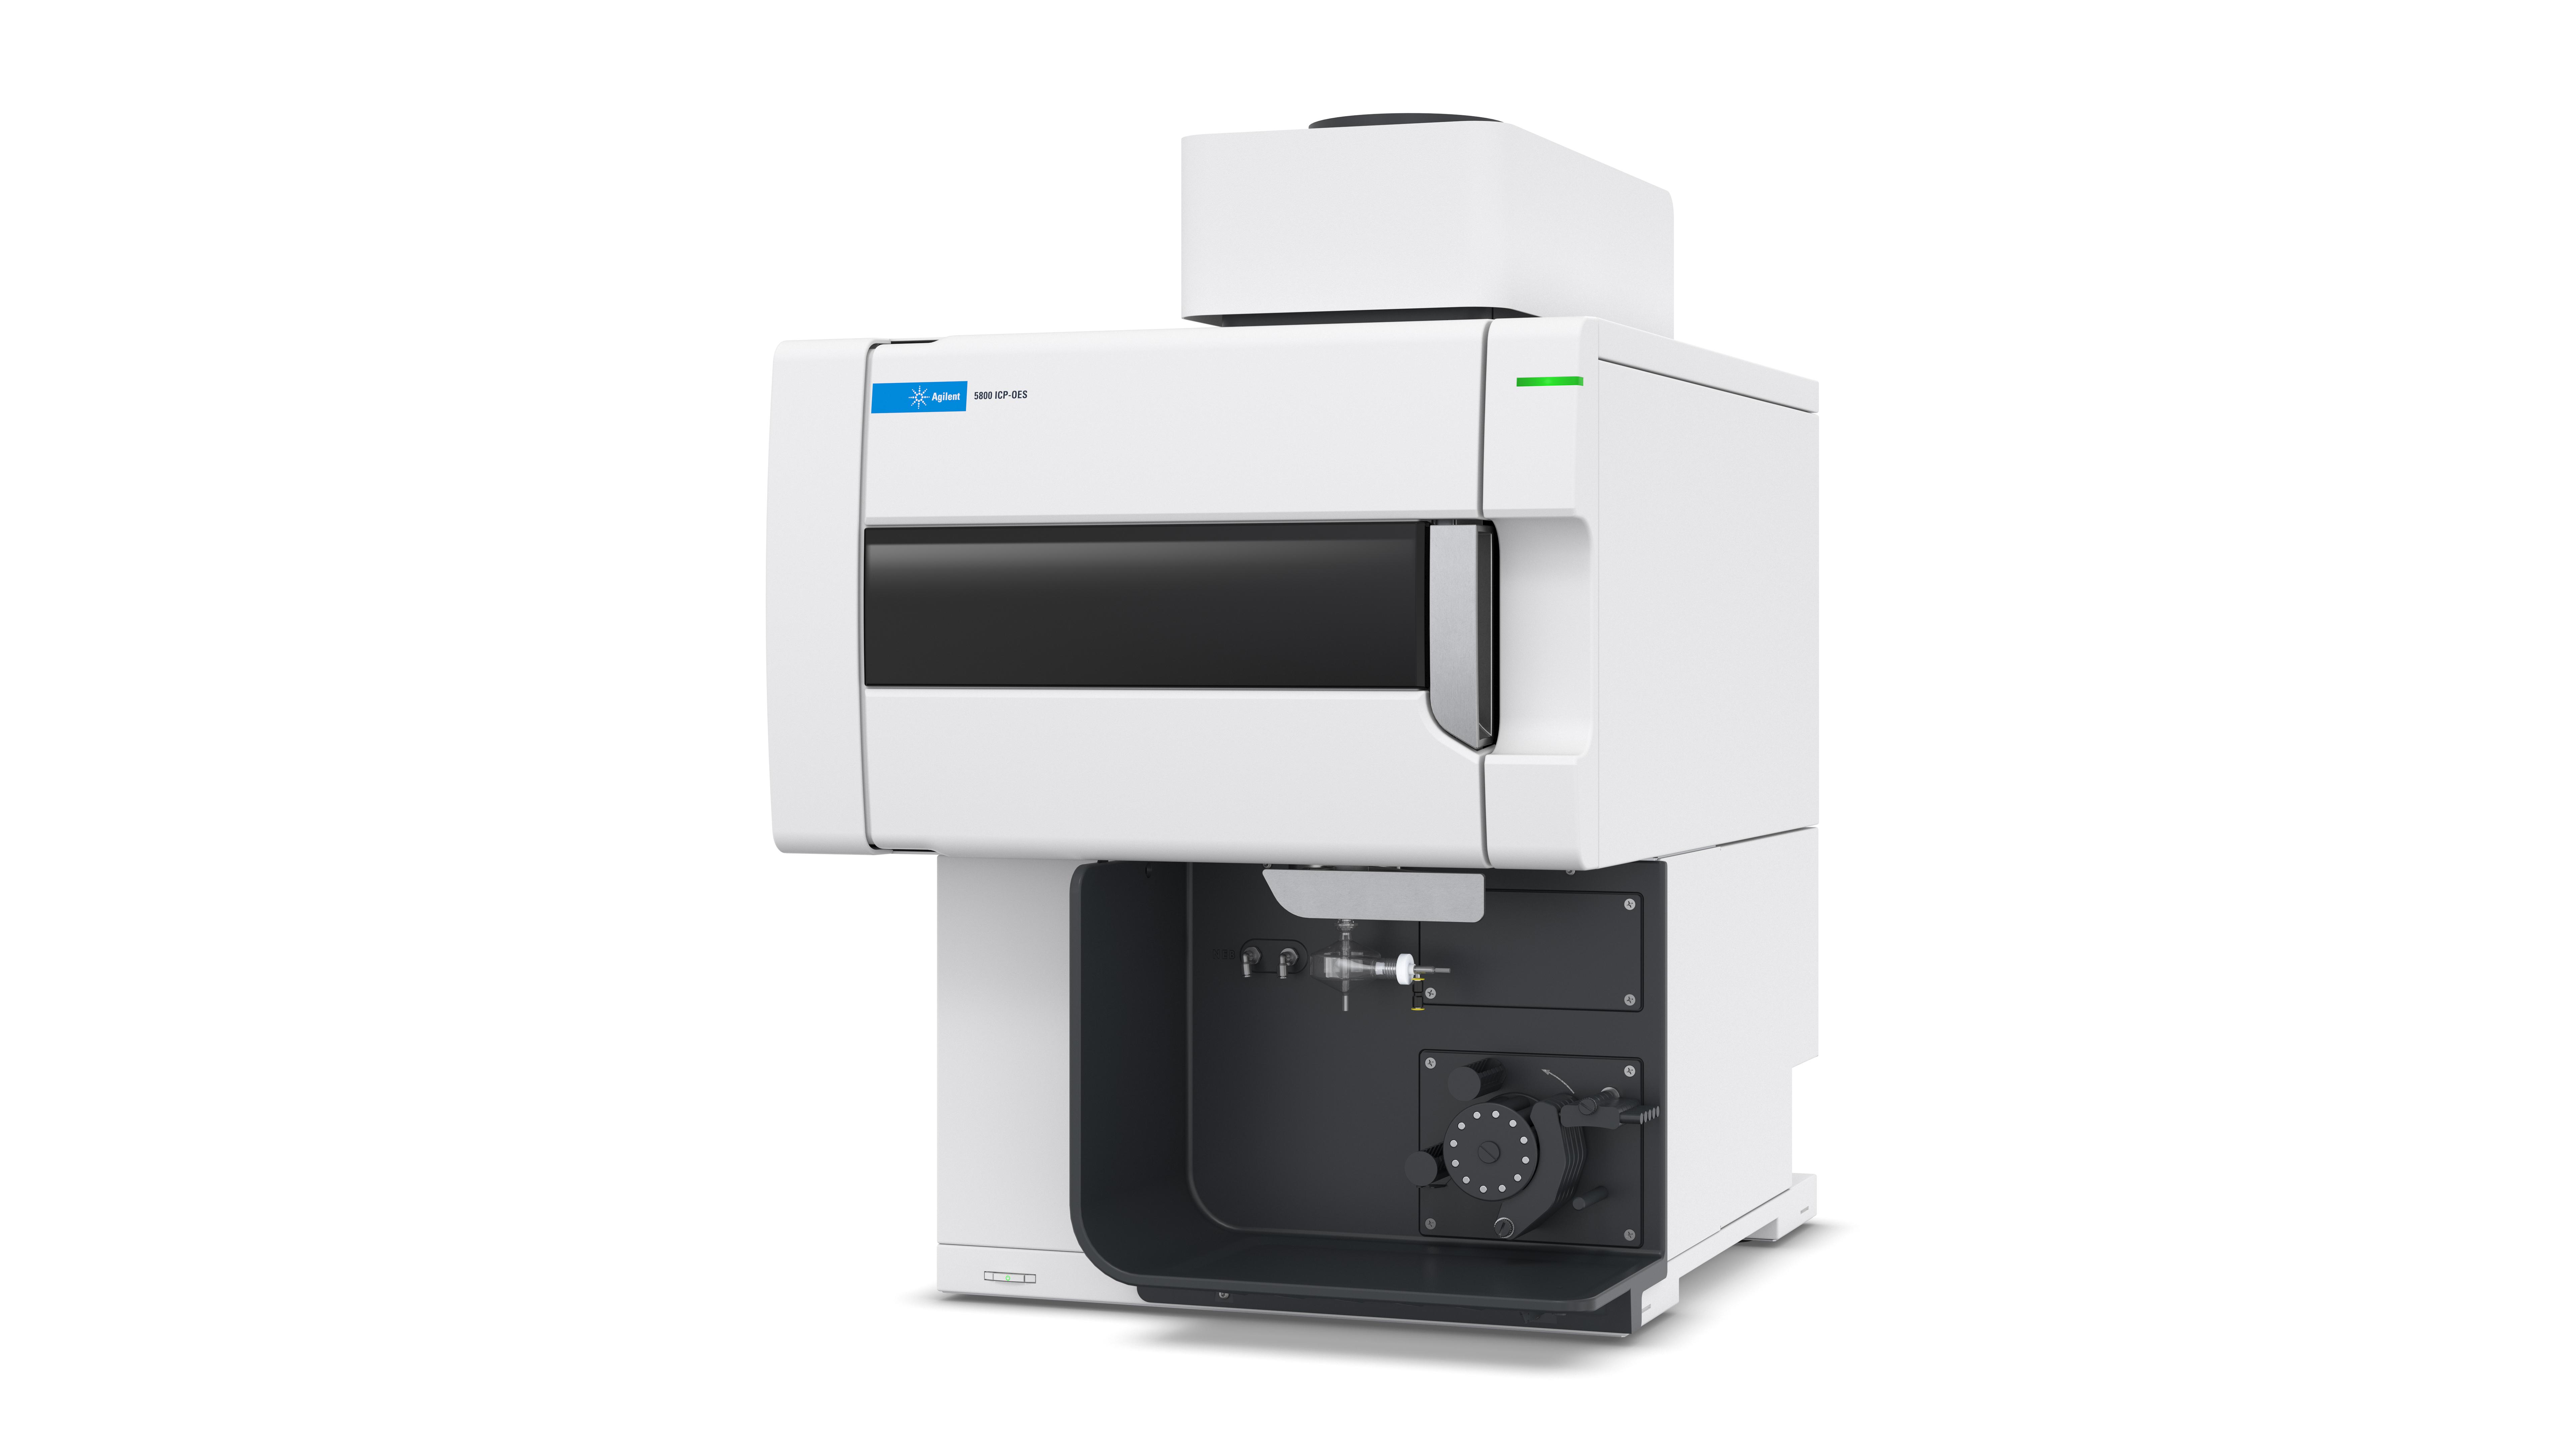 Agilent 5800 ICP-OES Instrument